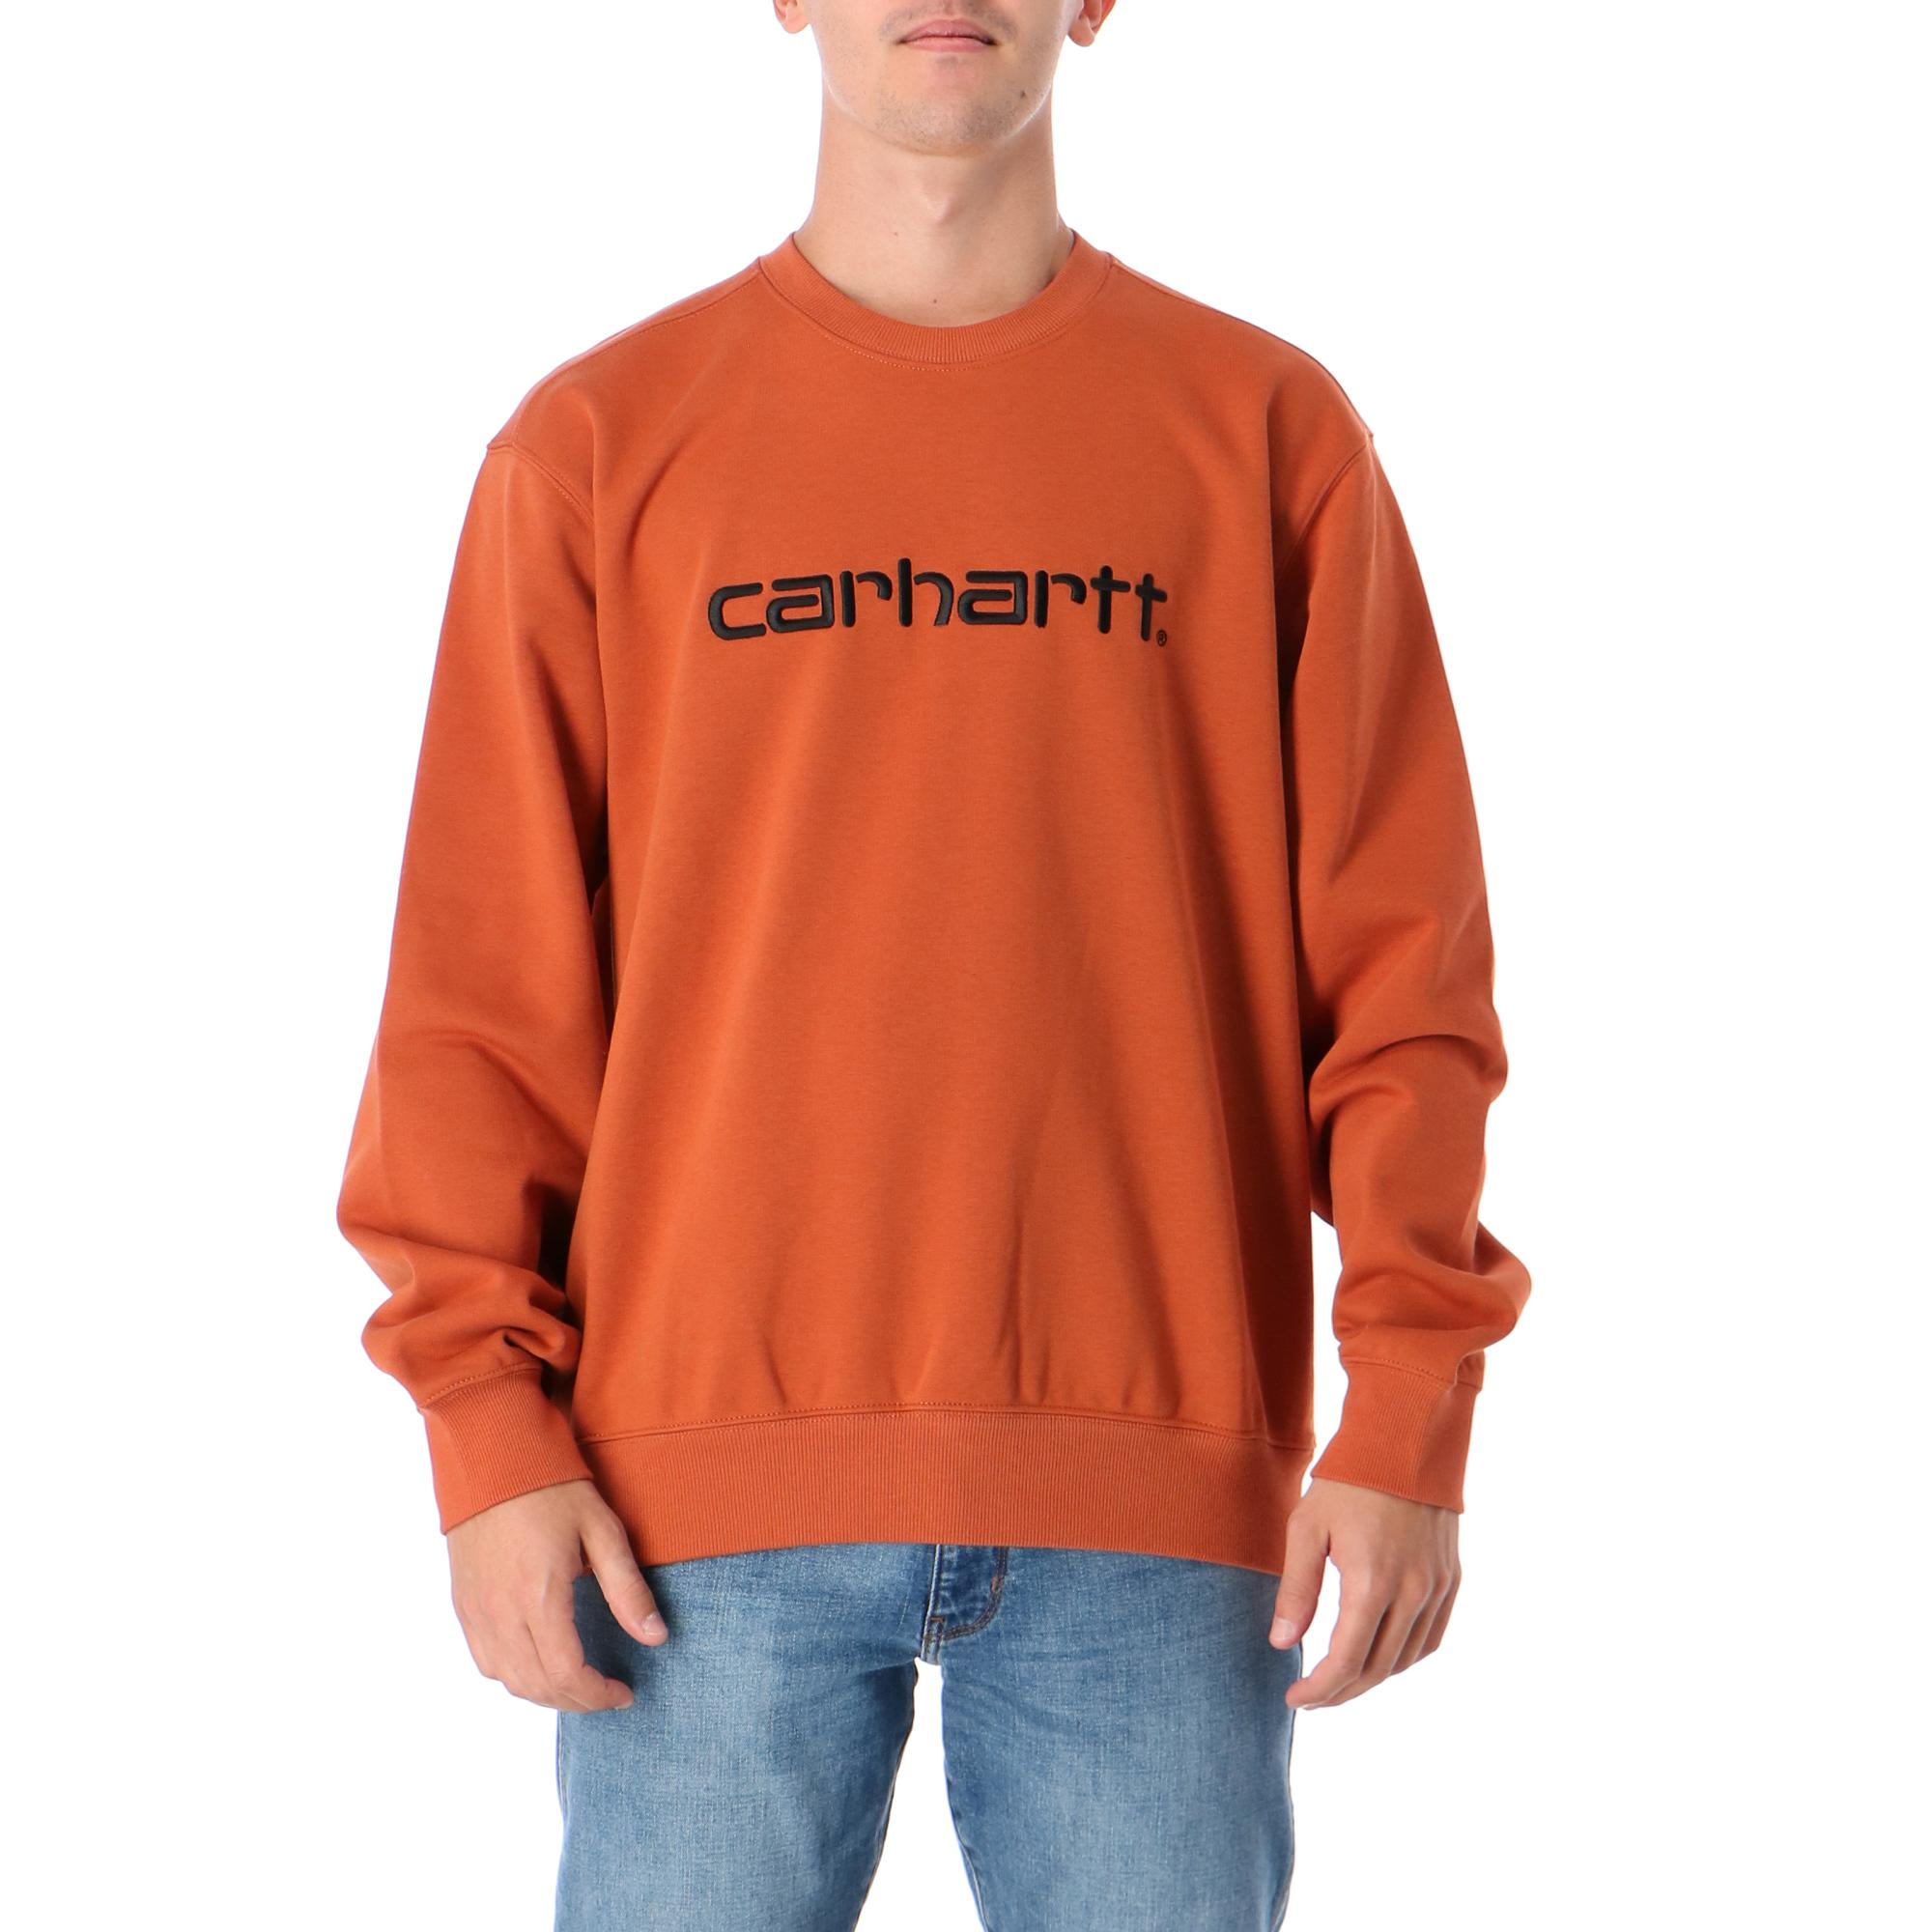 Carhartt Sweatshirt Cinnamon black